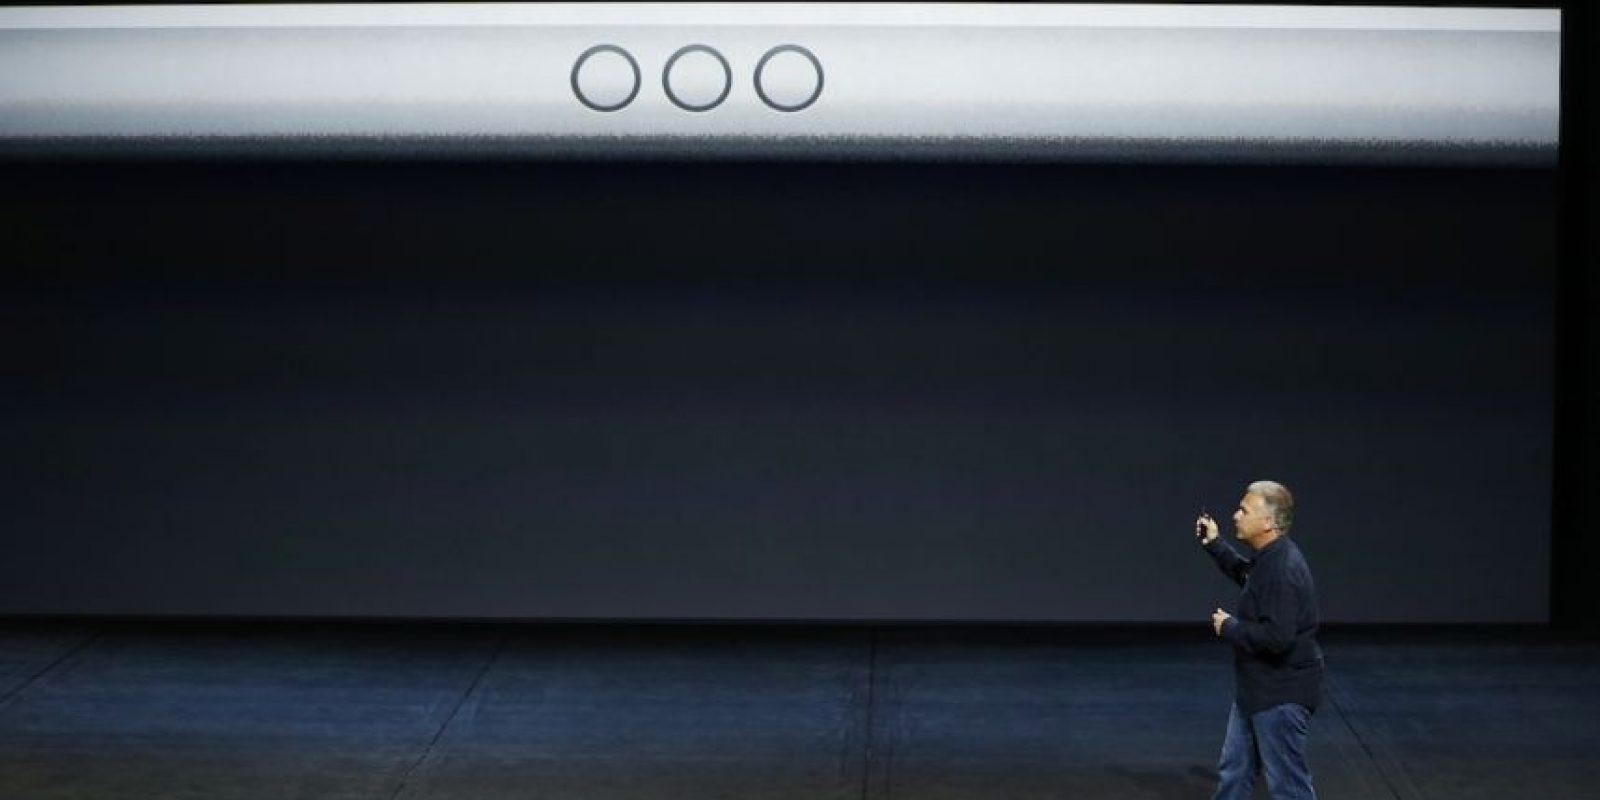 Peso modelo Wi-Fi + celular: 723 gramos (1.59 libras). Foto:Getty Images